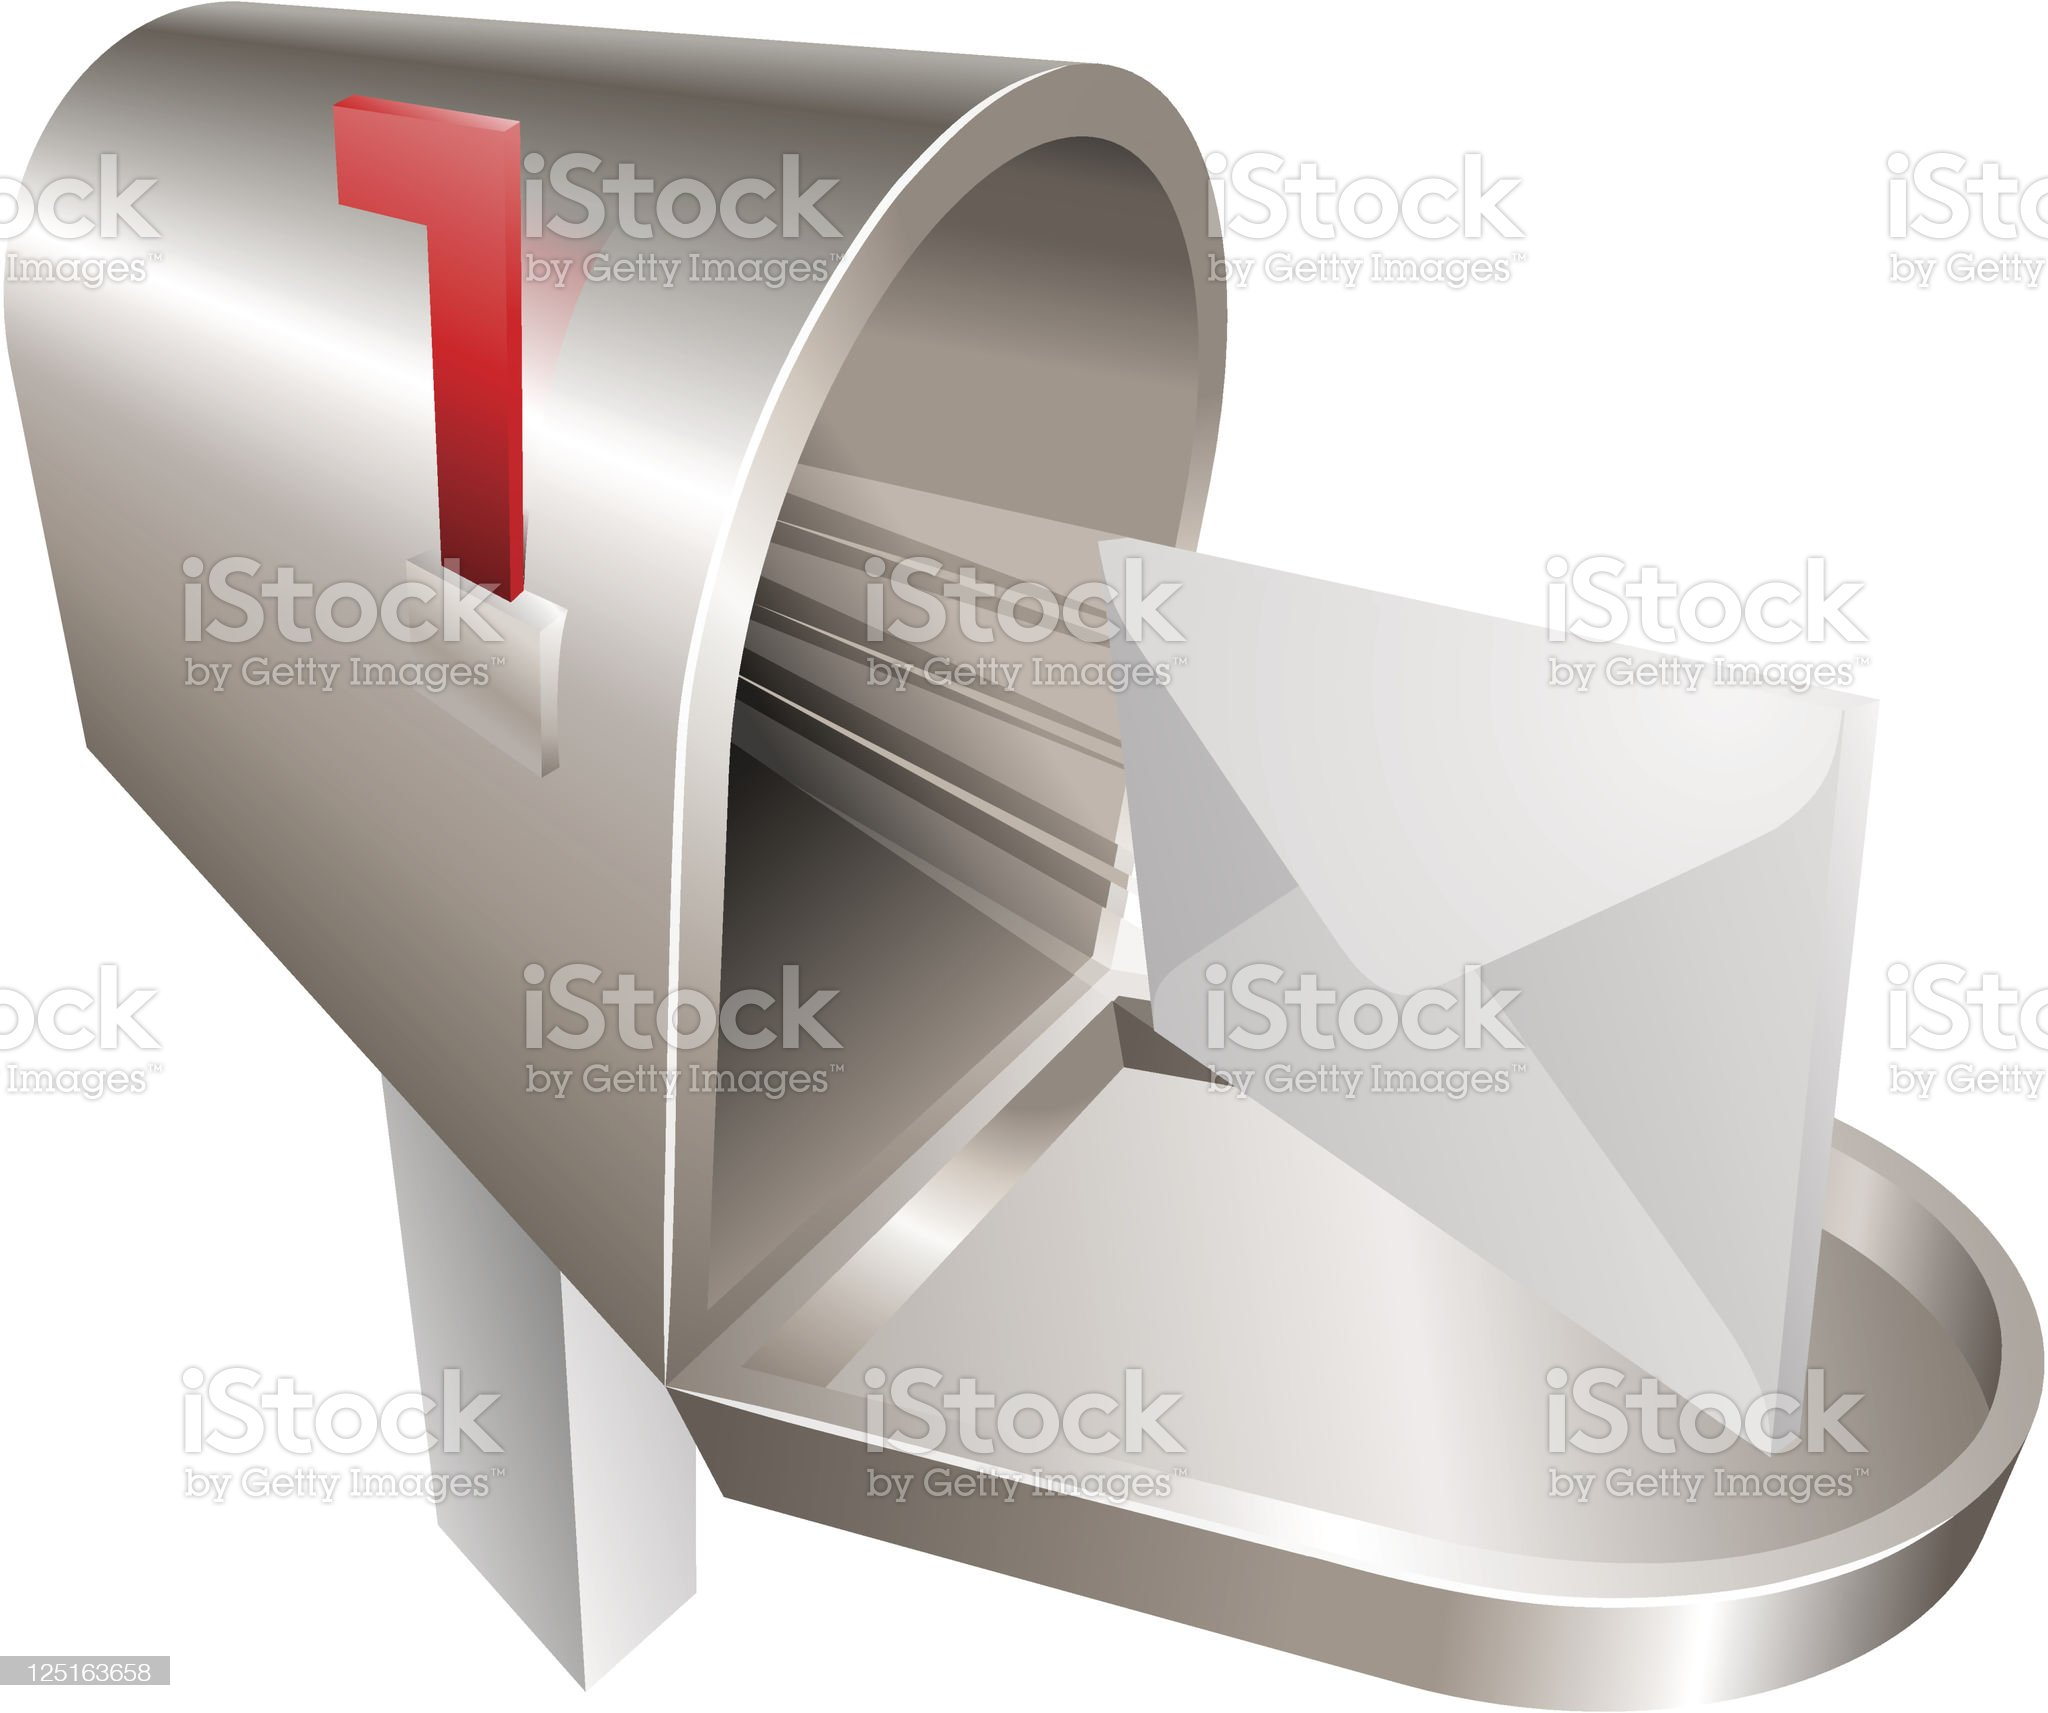 Mailbox illustration concept royalty-free stock vector art